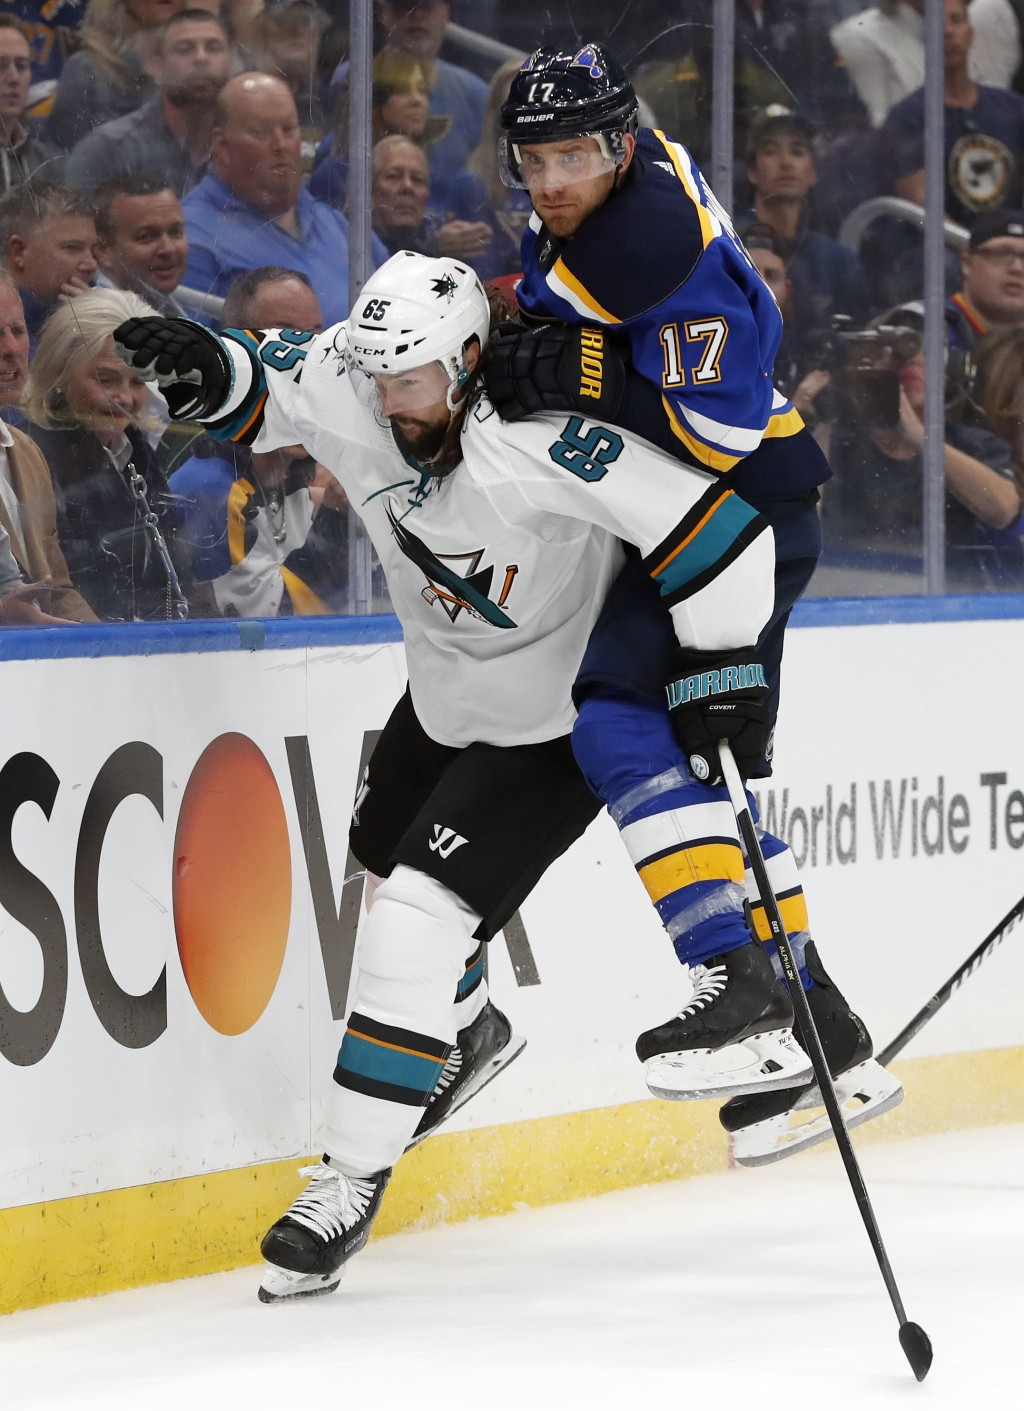 St. Louis Blues left wing Jaden Schwartz (17) lands on the back of San Jose Sharks defenseman Erik Karlsson (65), of Sweden, during the third period i